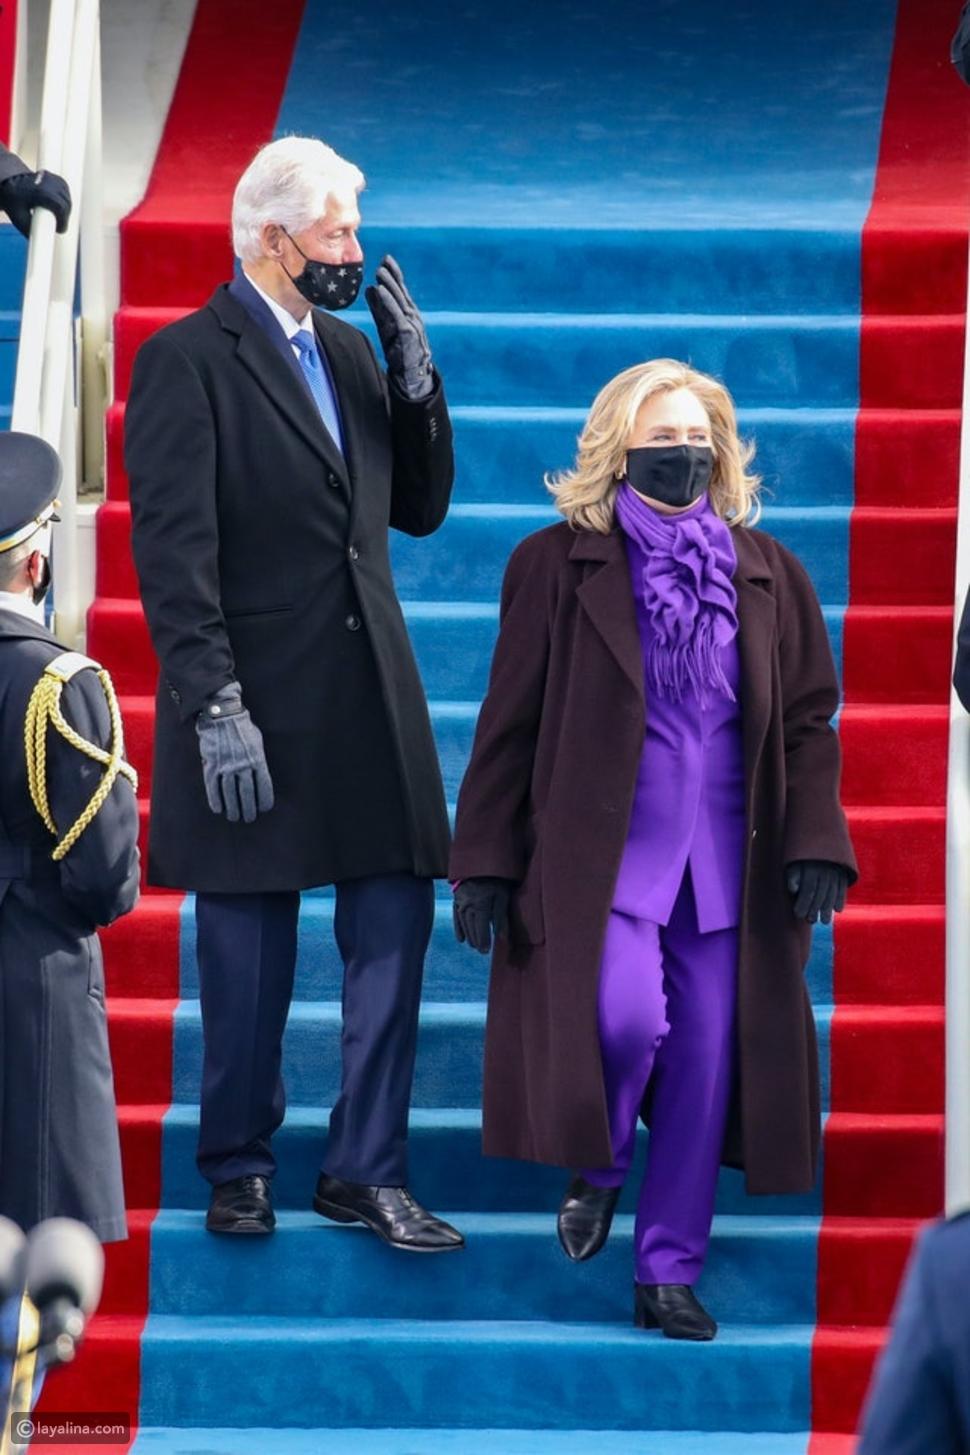 أزياء هيلاريكلينتون Hillary Clintonفي حفل تنصيب جو بايدن